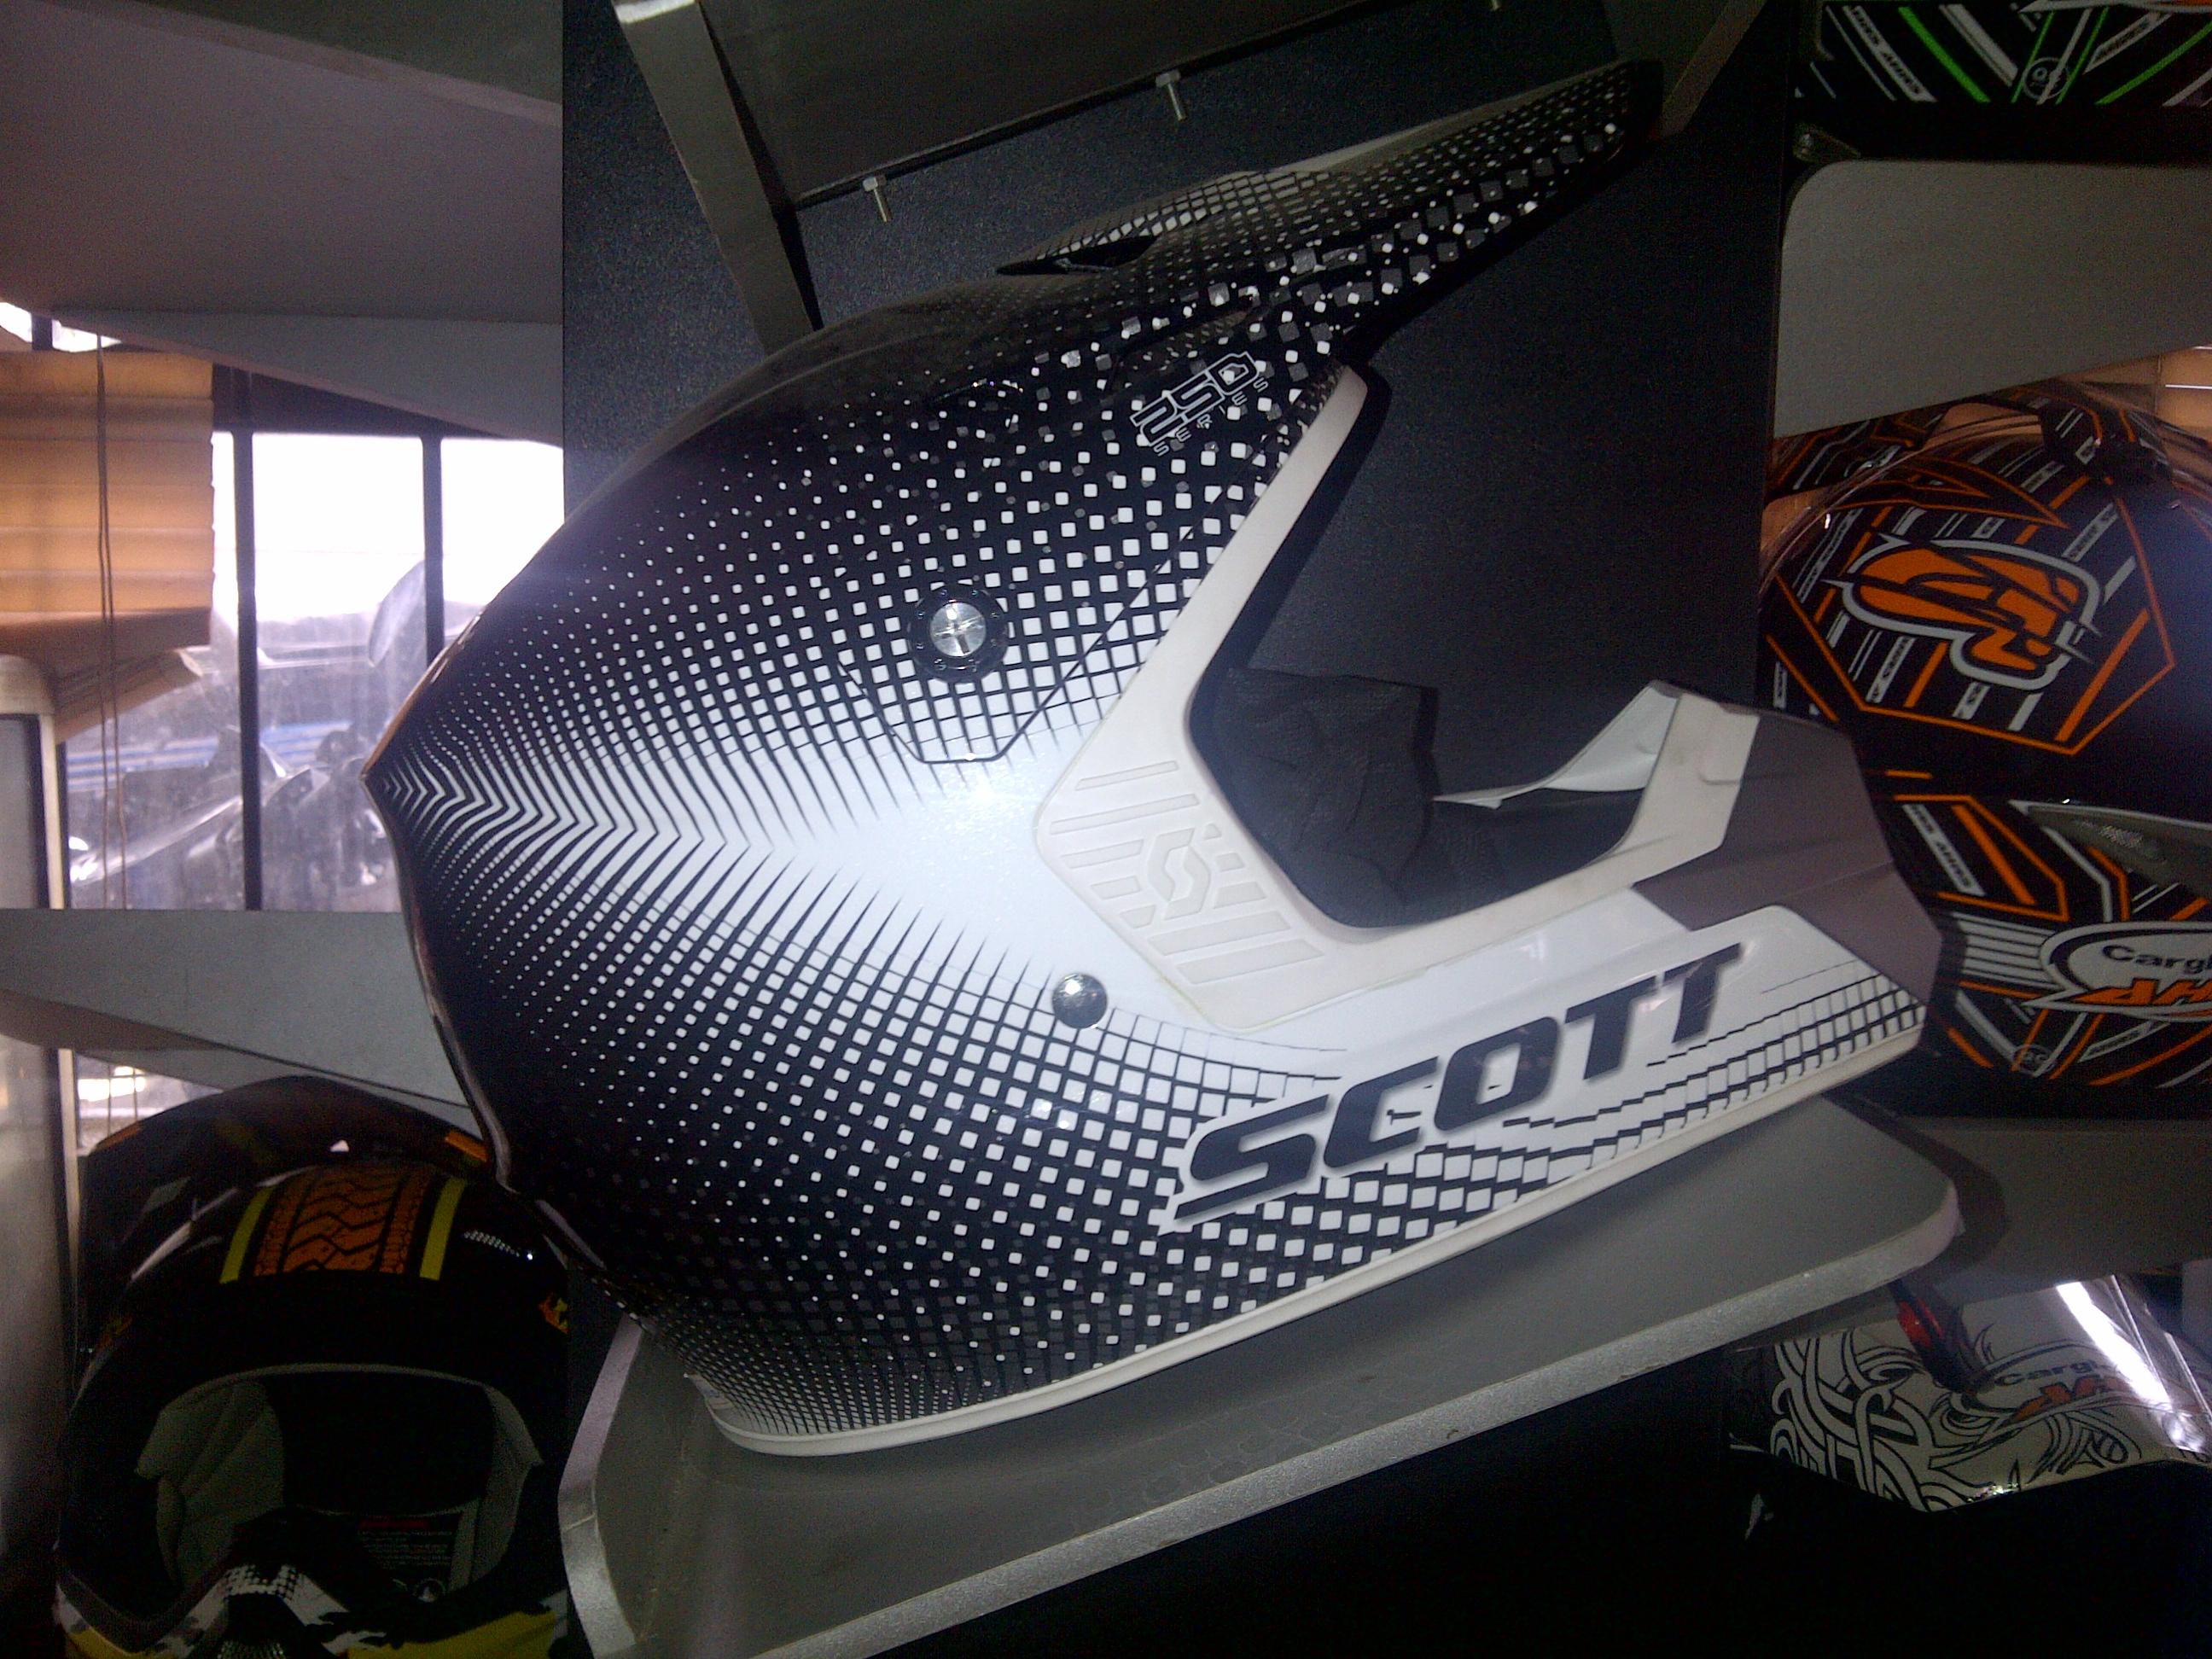 IMG 20130315 00009 Jual helm trail merk SCOT usa